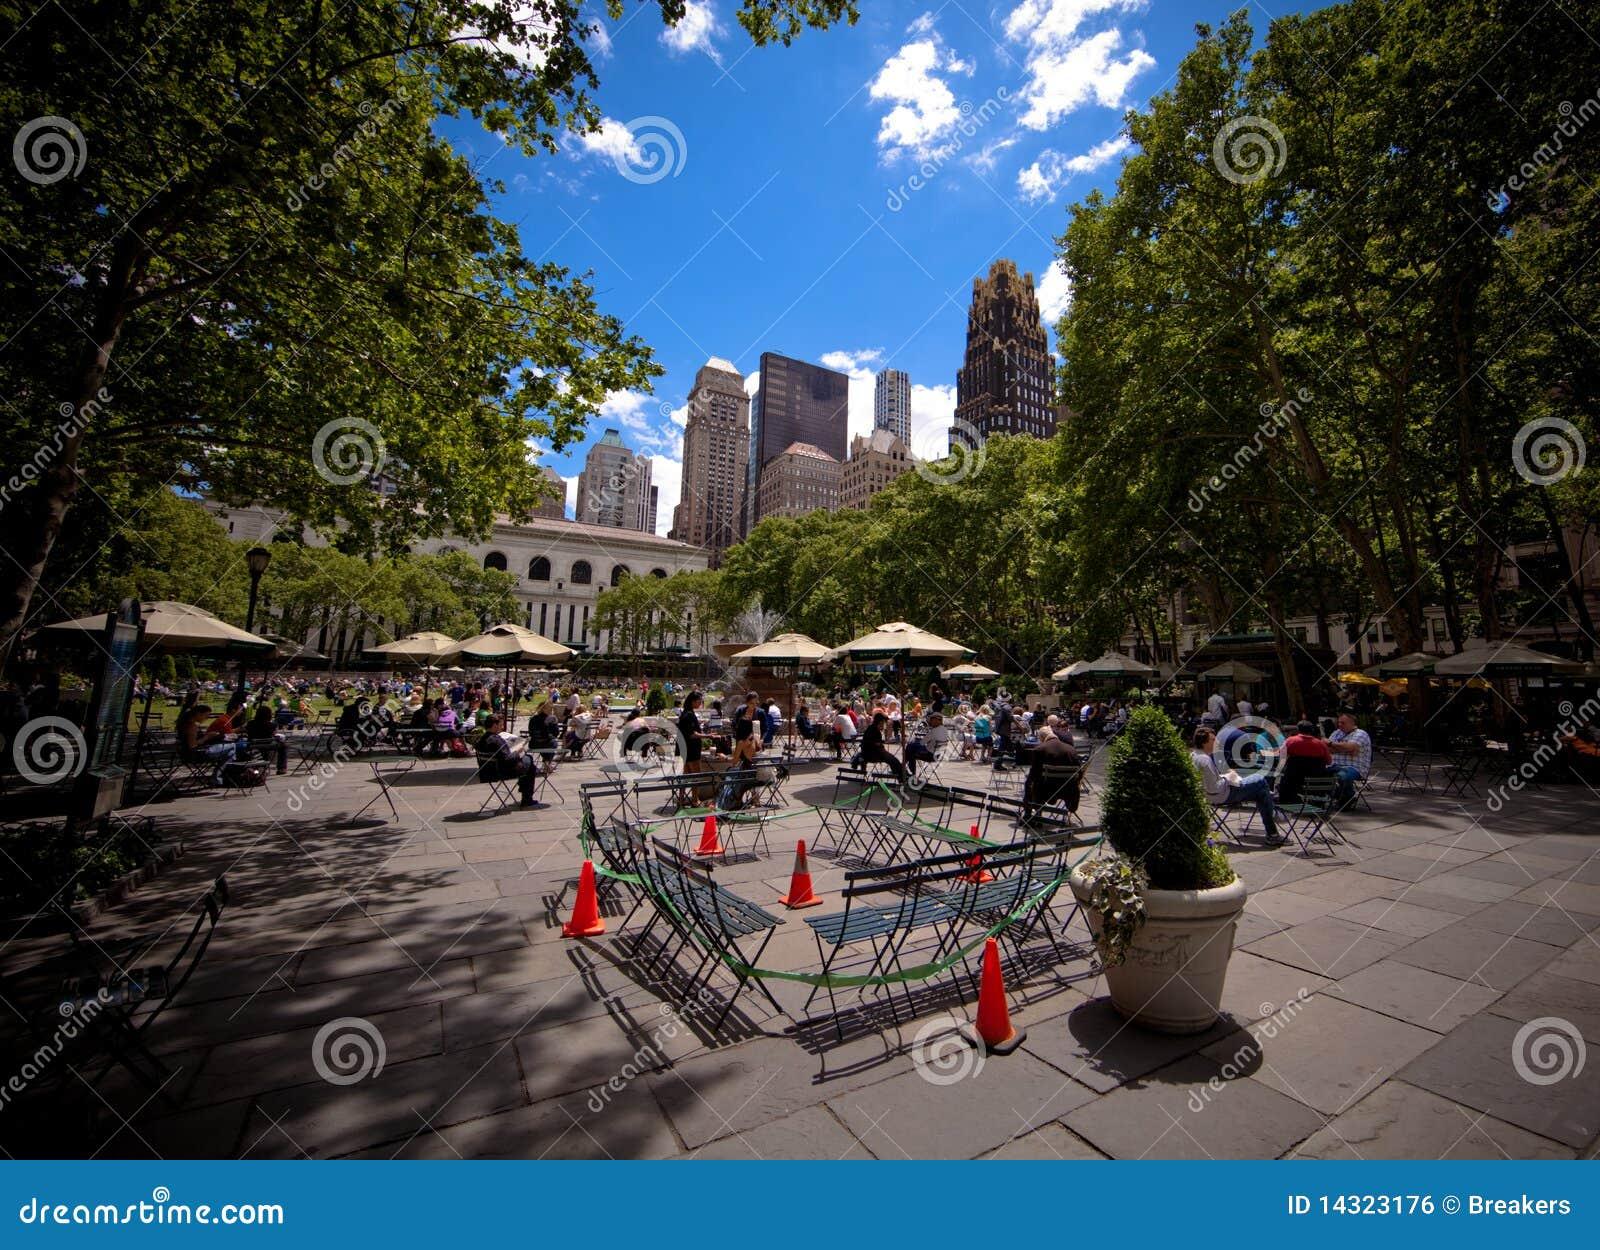 Parque de Bryant en Manhattan en New York City